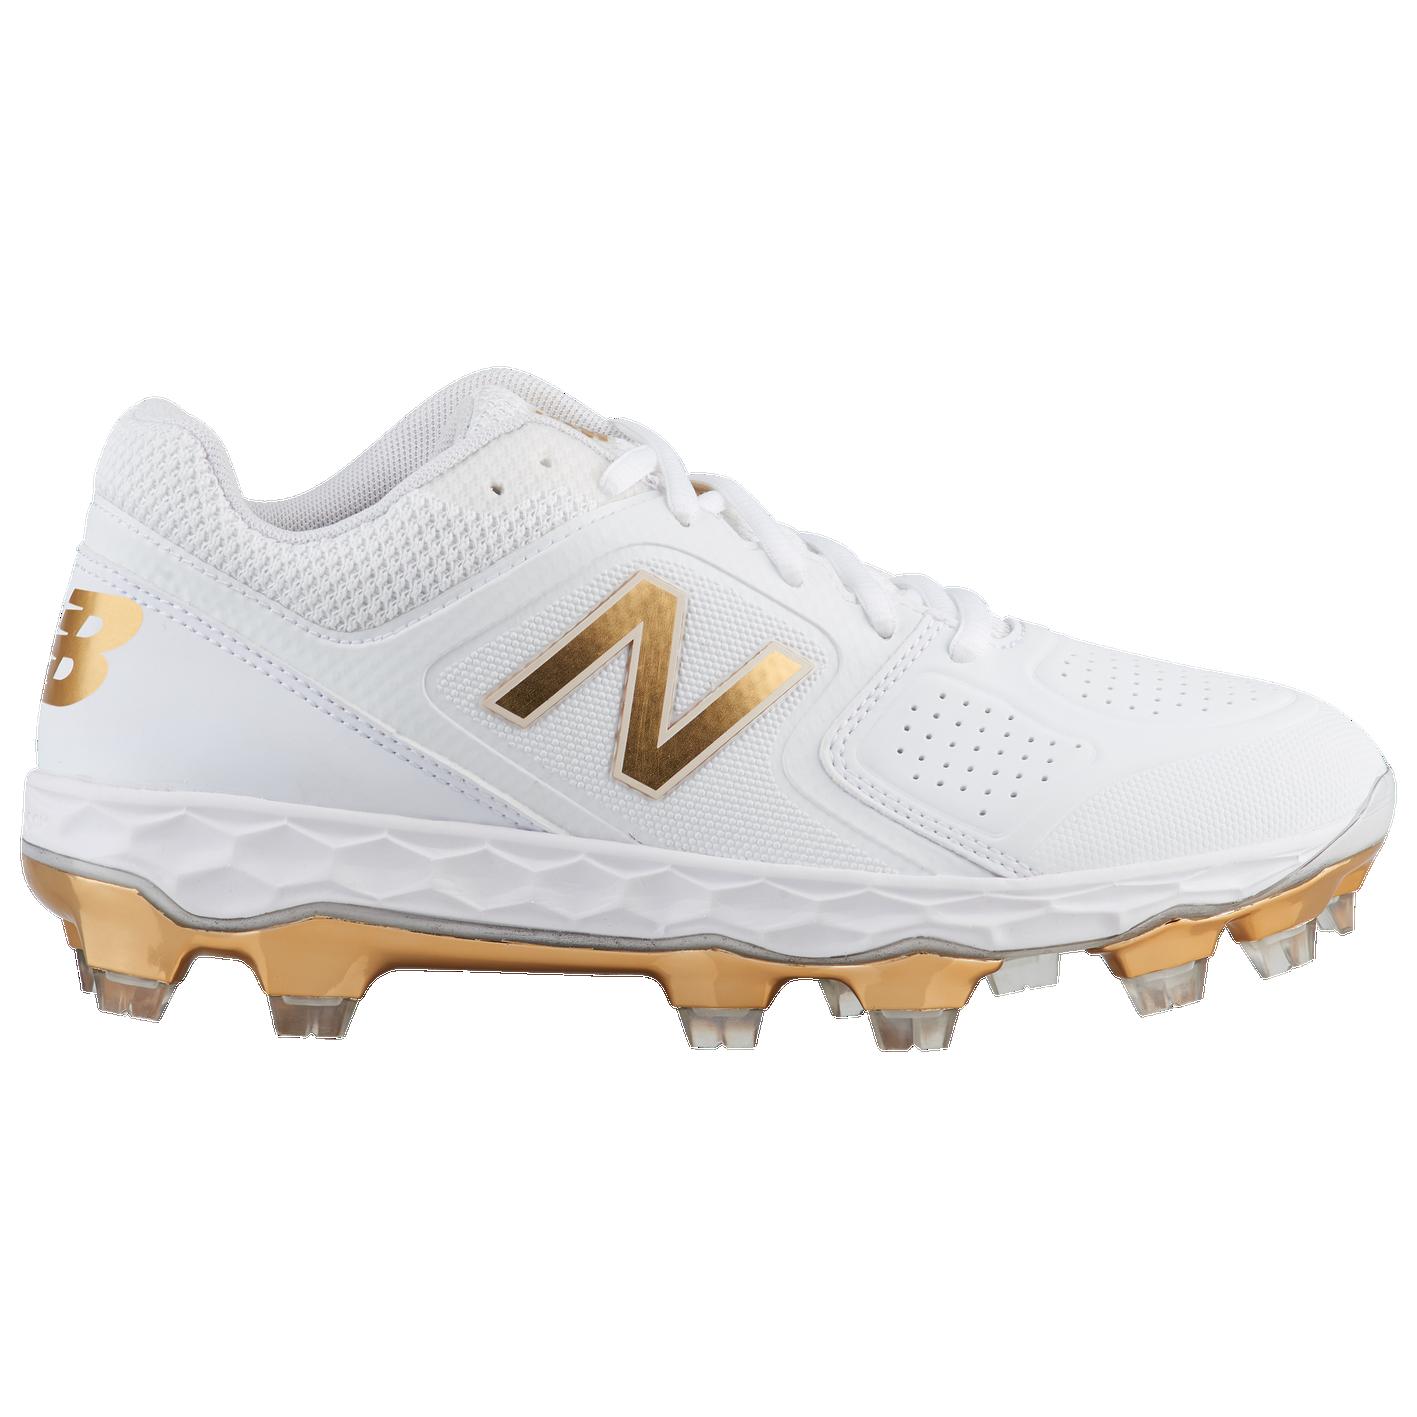 2d4de588d New Balance SPVELOv1 LE TPU Low - Women s - Softball - Shoes - White ...